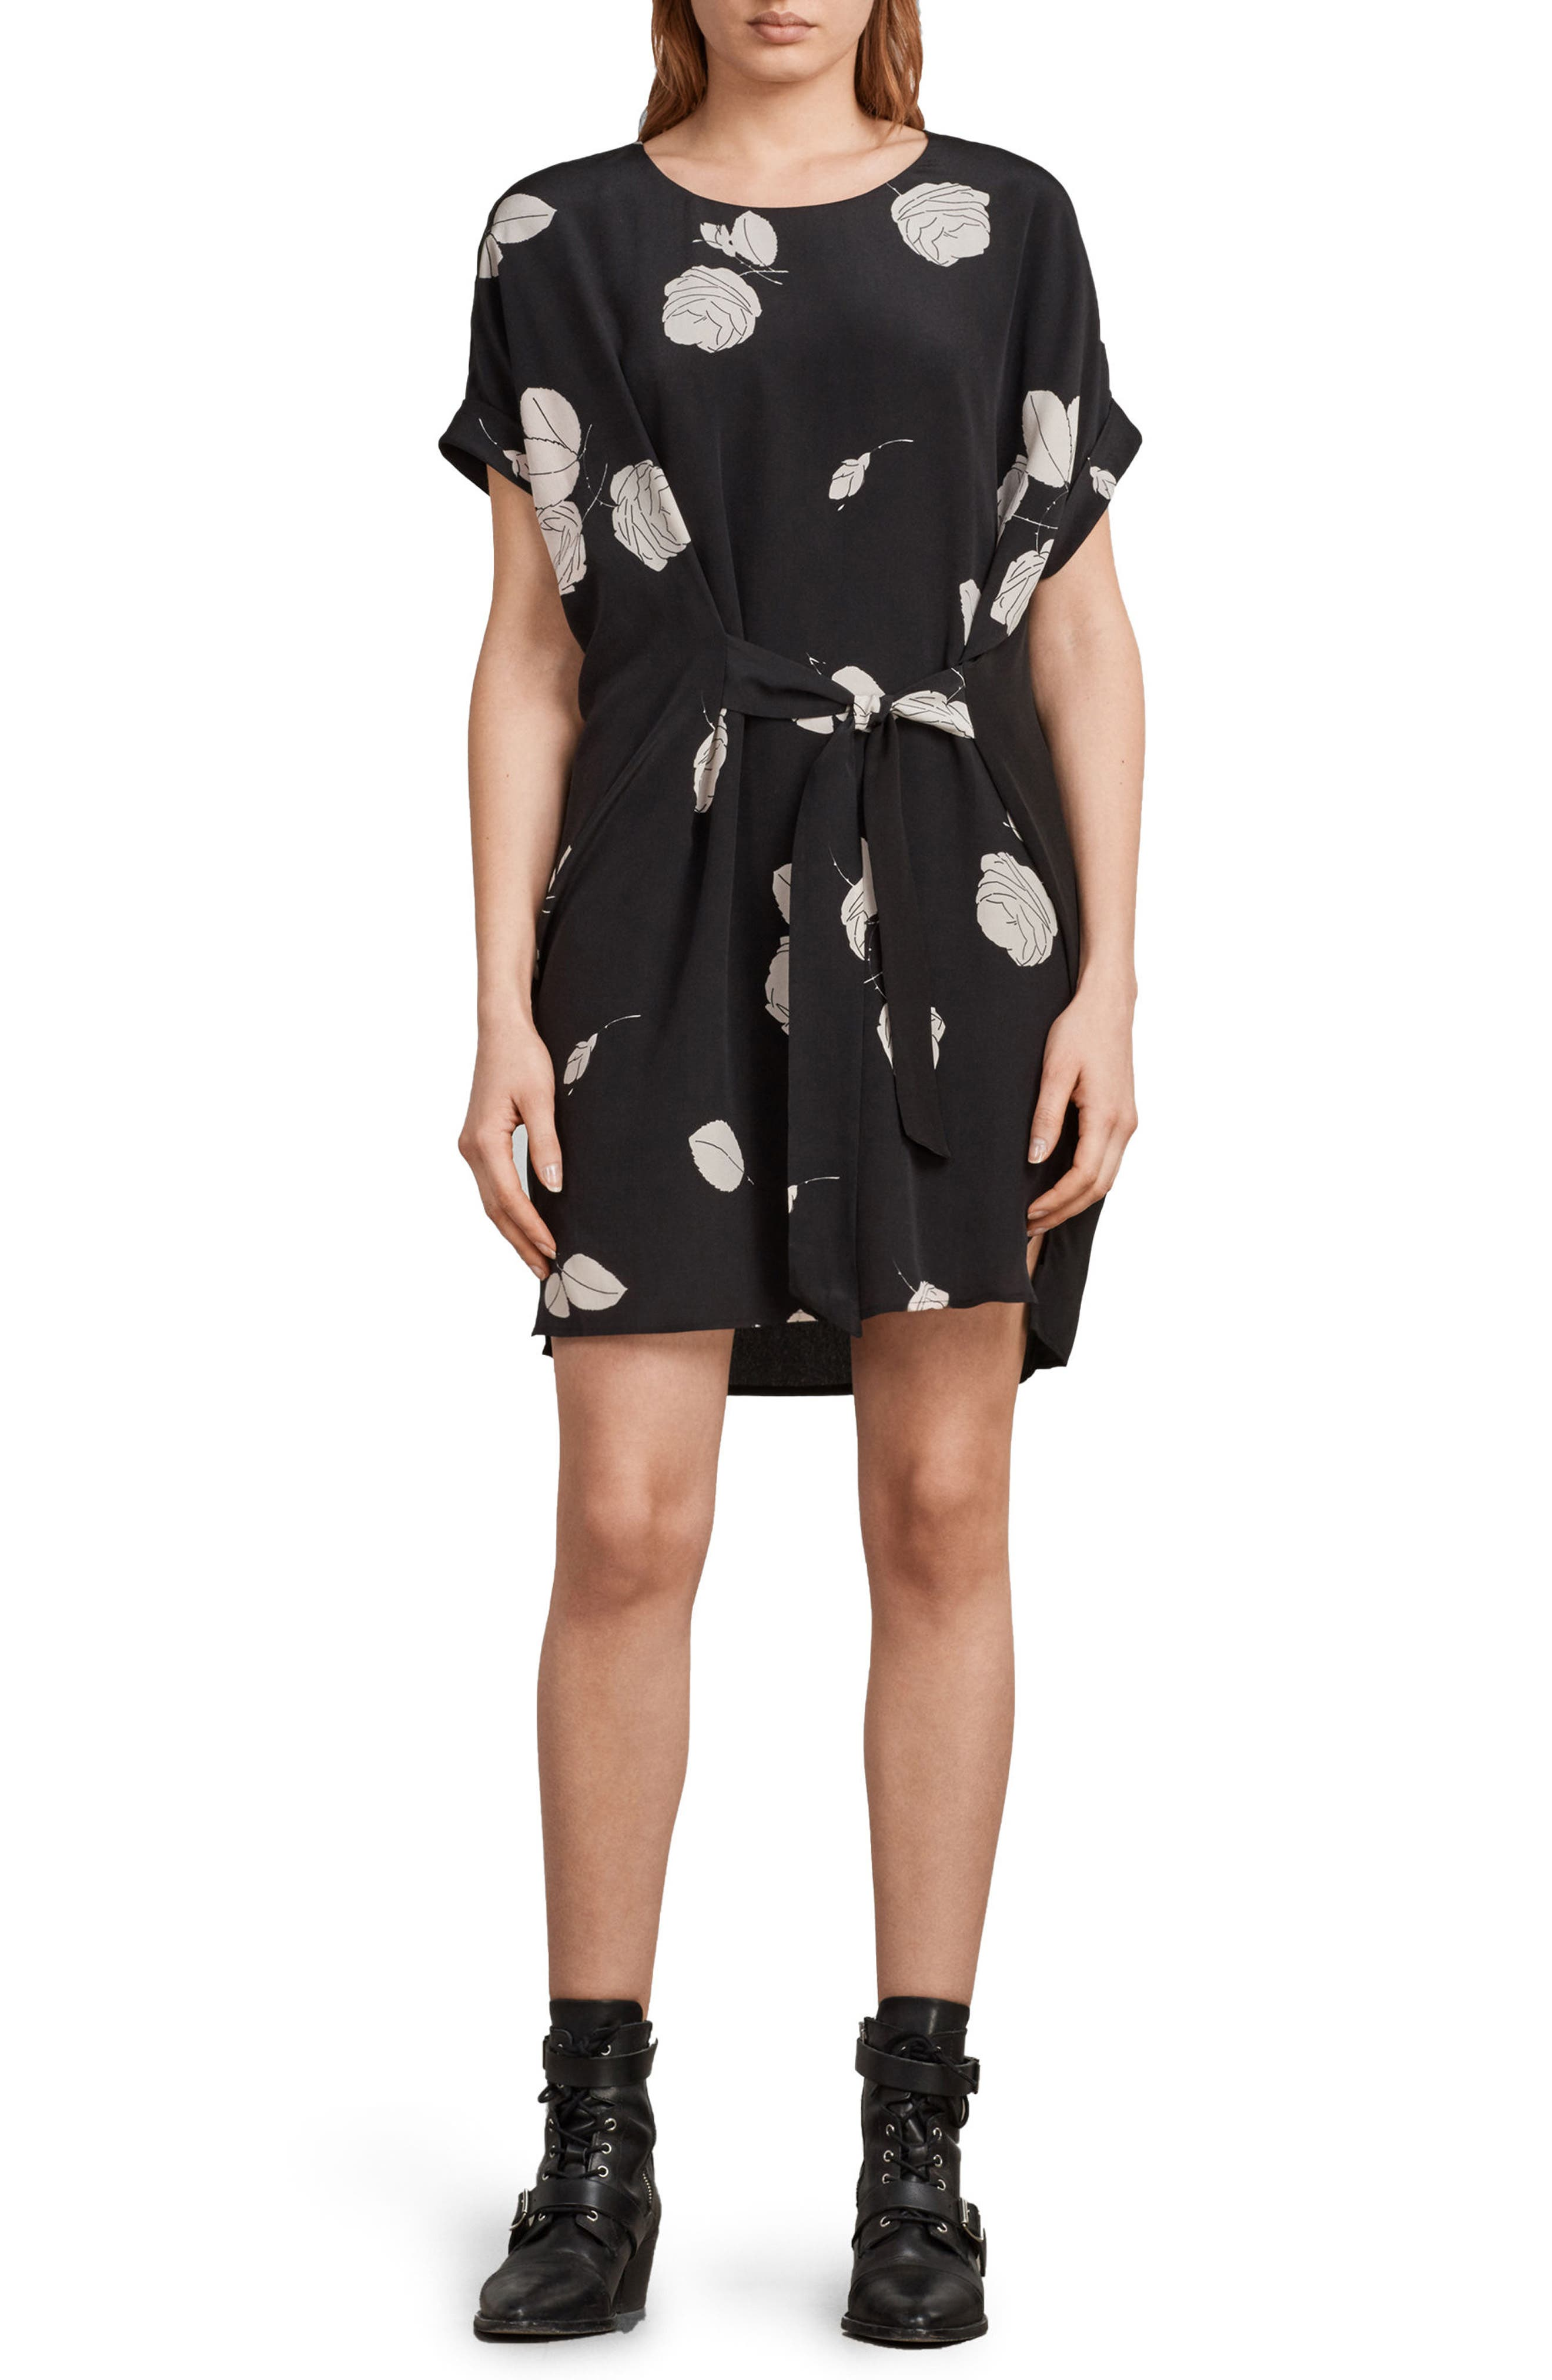 Sonny Rodin Silk Dress,                         Main,                         color, Black